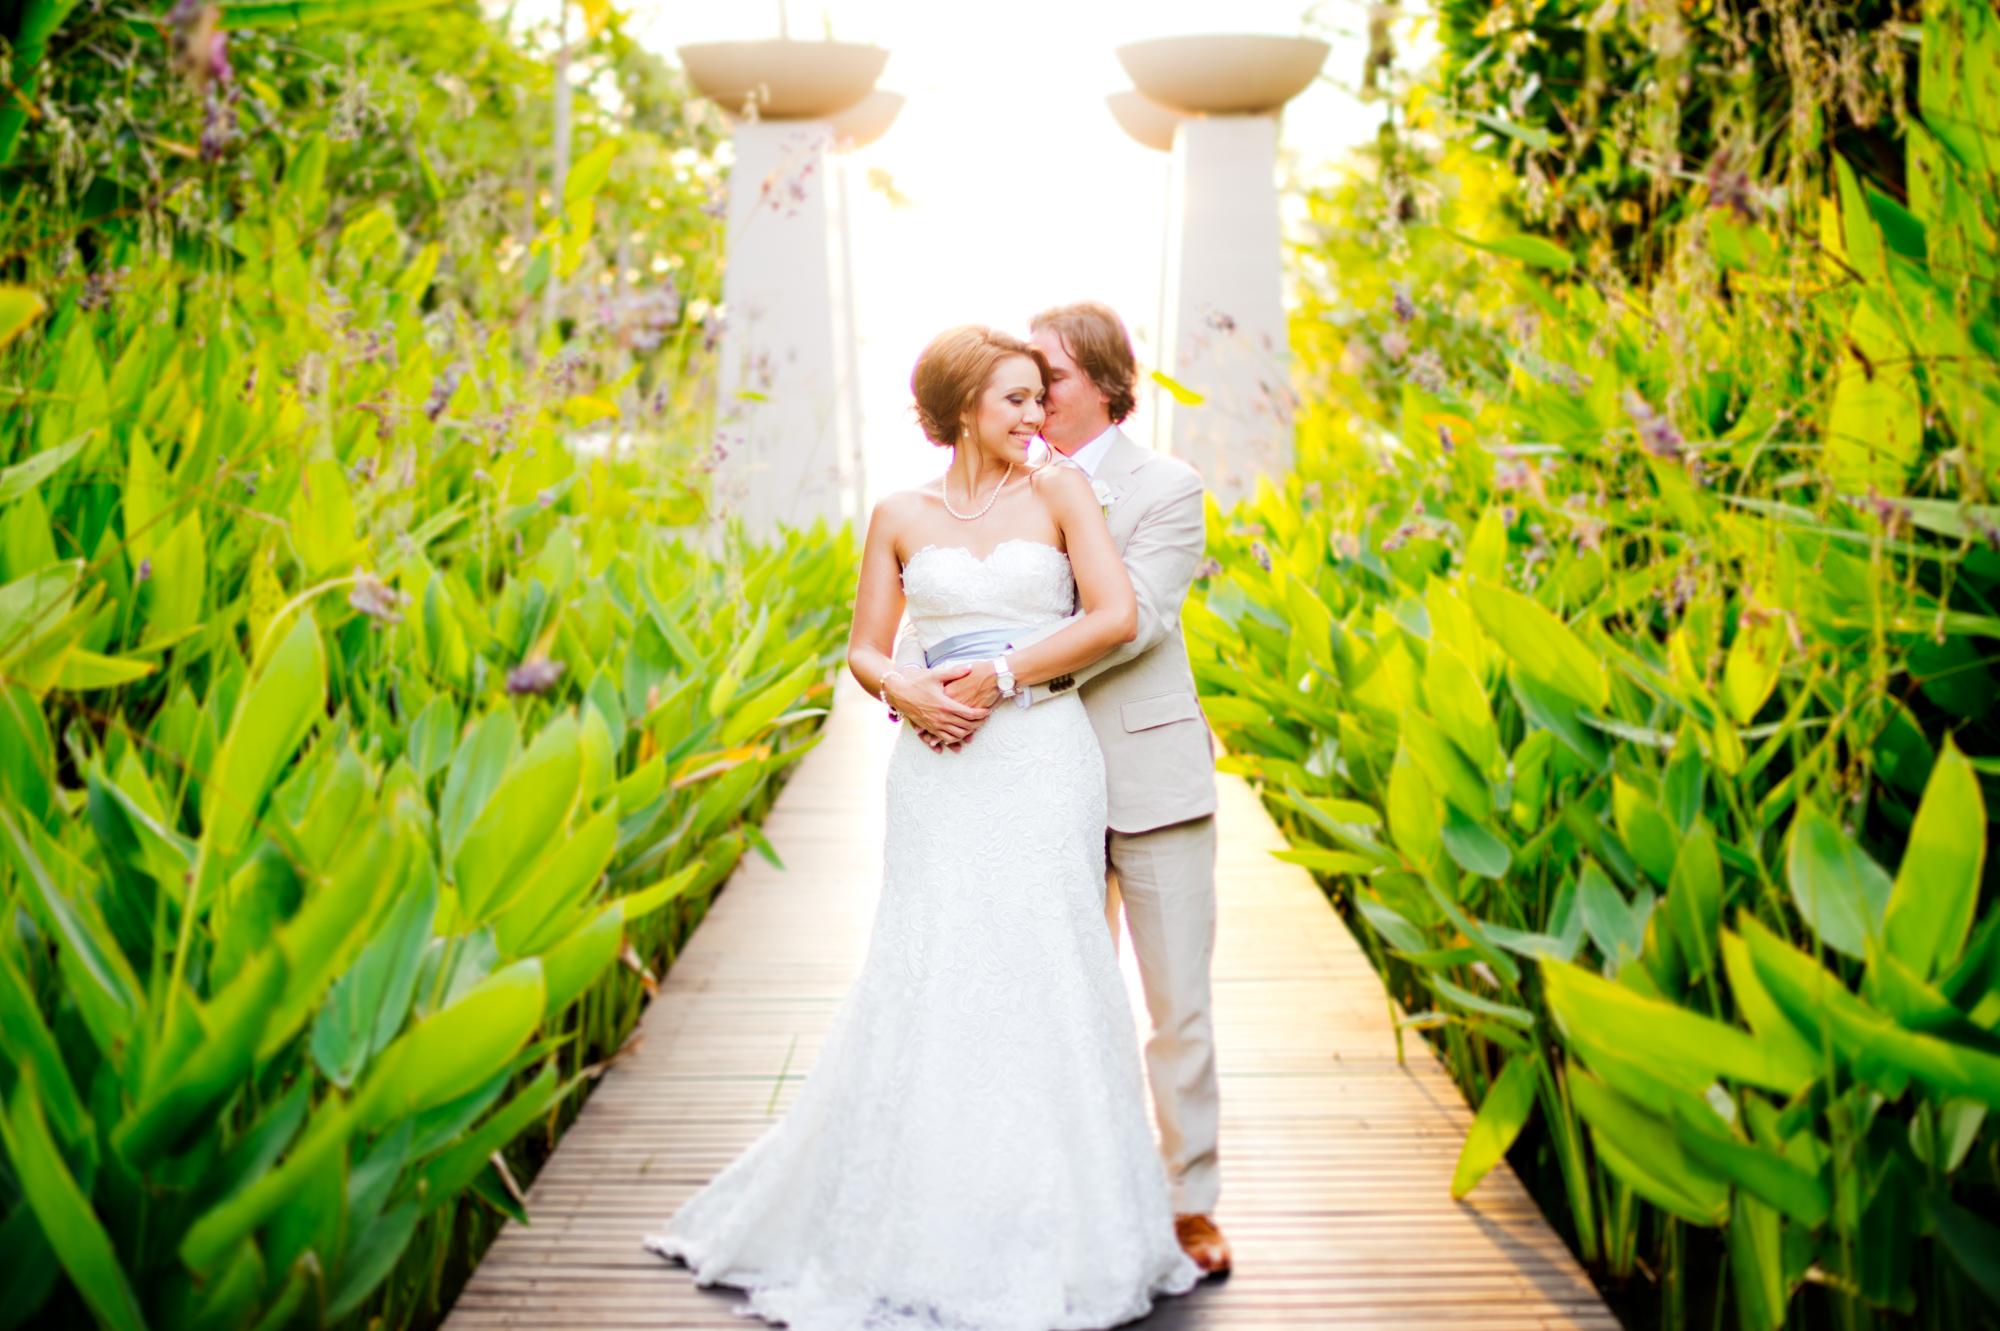 Koh Tao Beach Wedding - Ko Tao Wedding Photographer